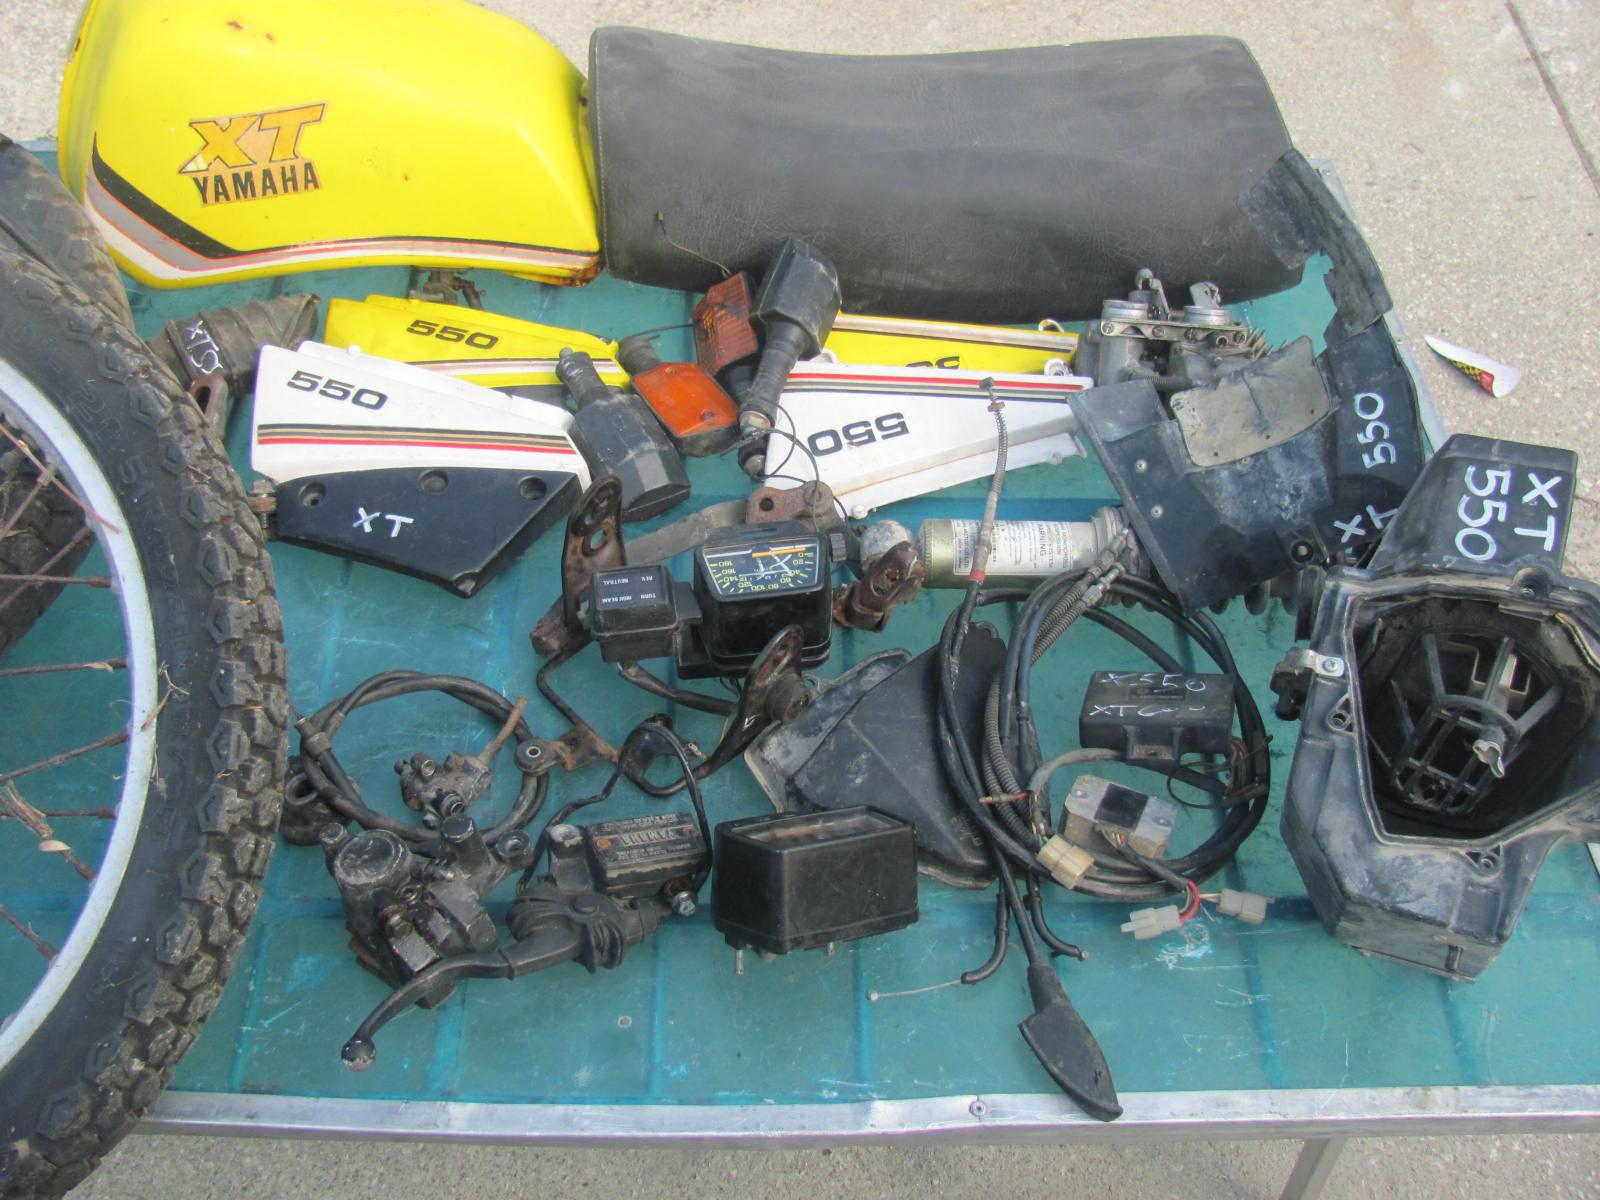 YAMAHA XT 550 | MOTOMARKET DOMINICI | I nostri articoli